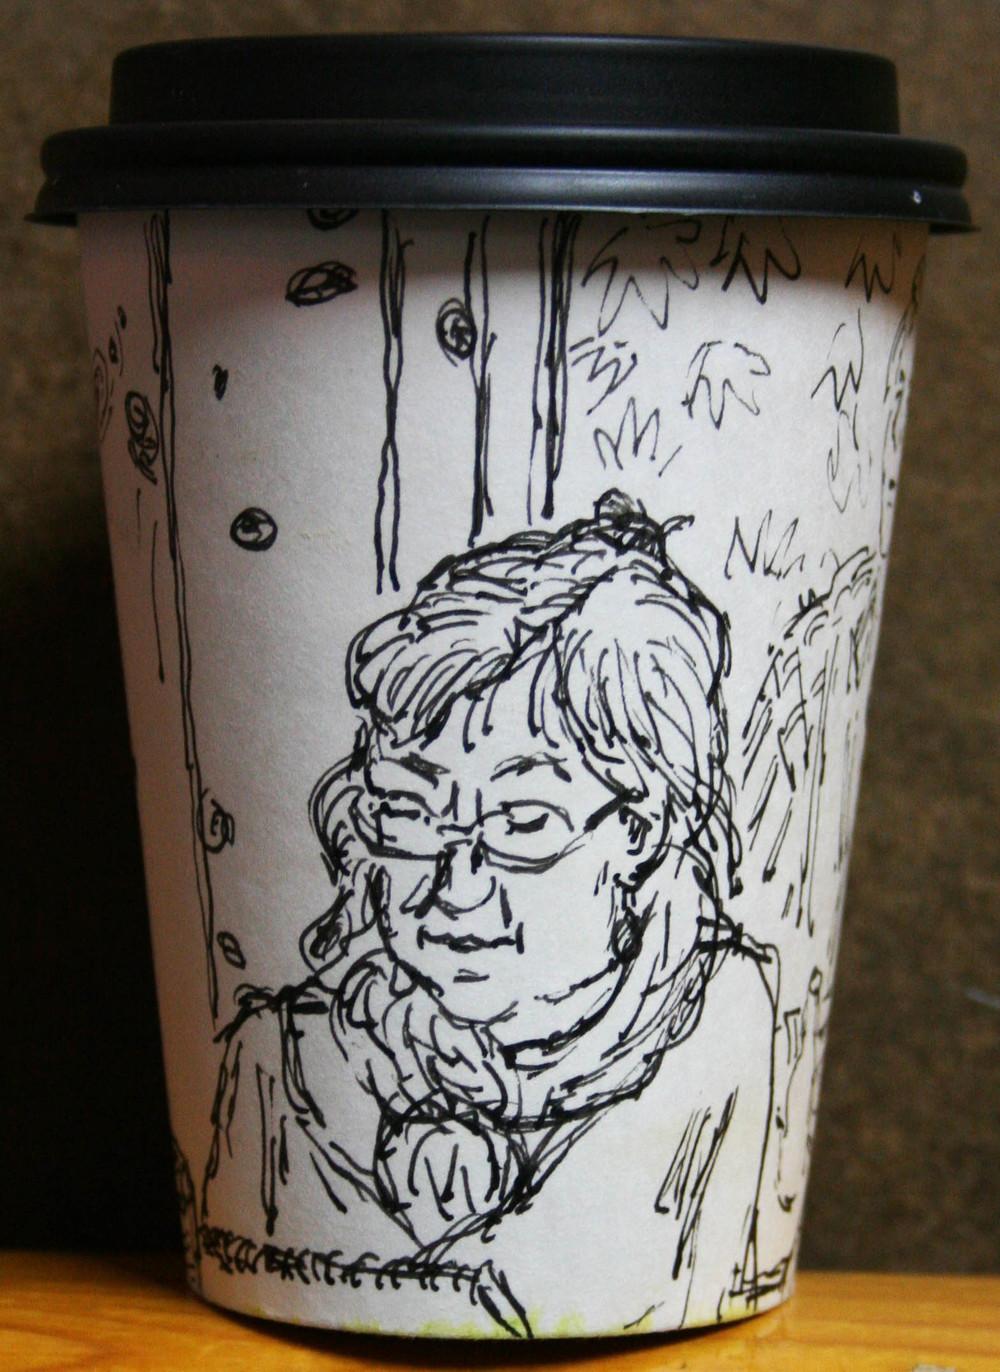 Jack Flotte's cup o Tom (side view w/Nancy Lick).